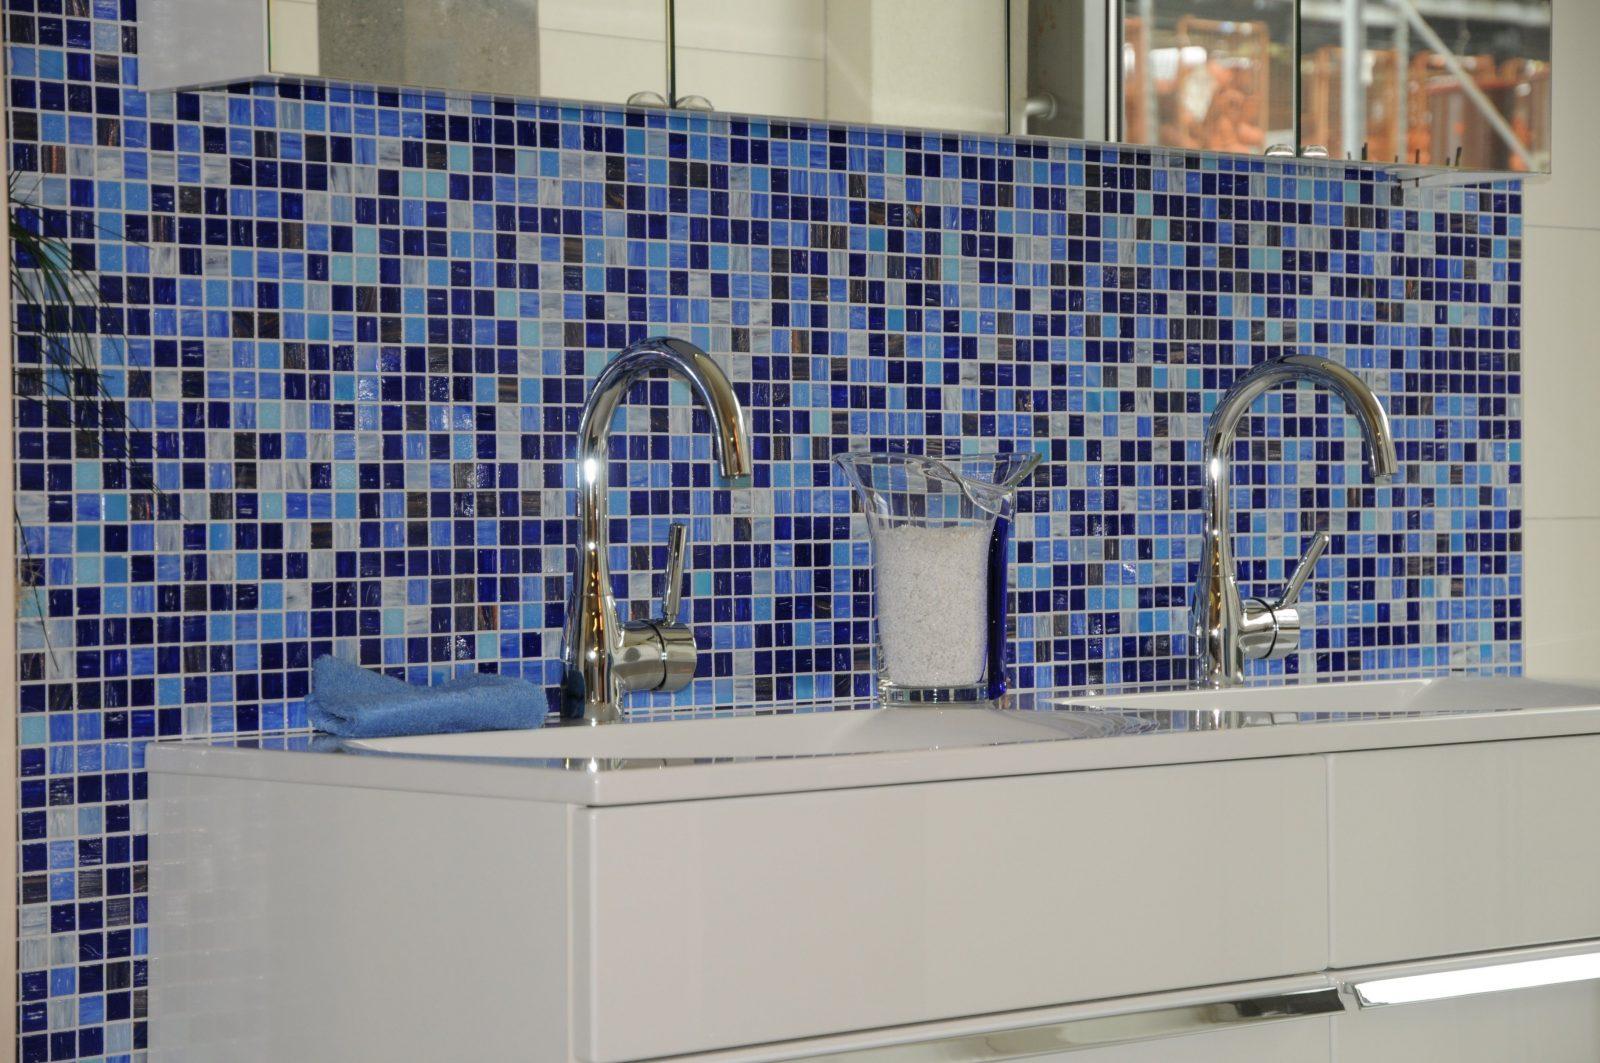 Marvellous Design Mosaik Fliesen Günstig Kaufen Obi Bad Glas von Mosaik Fliesen Günstig Restposten Bild